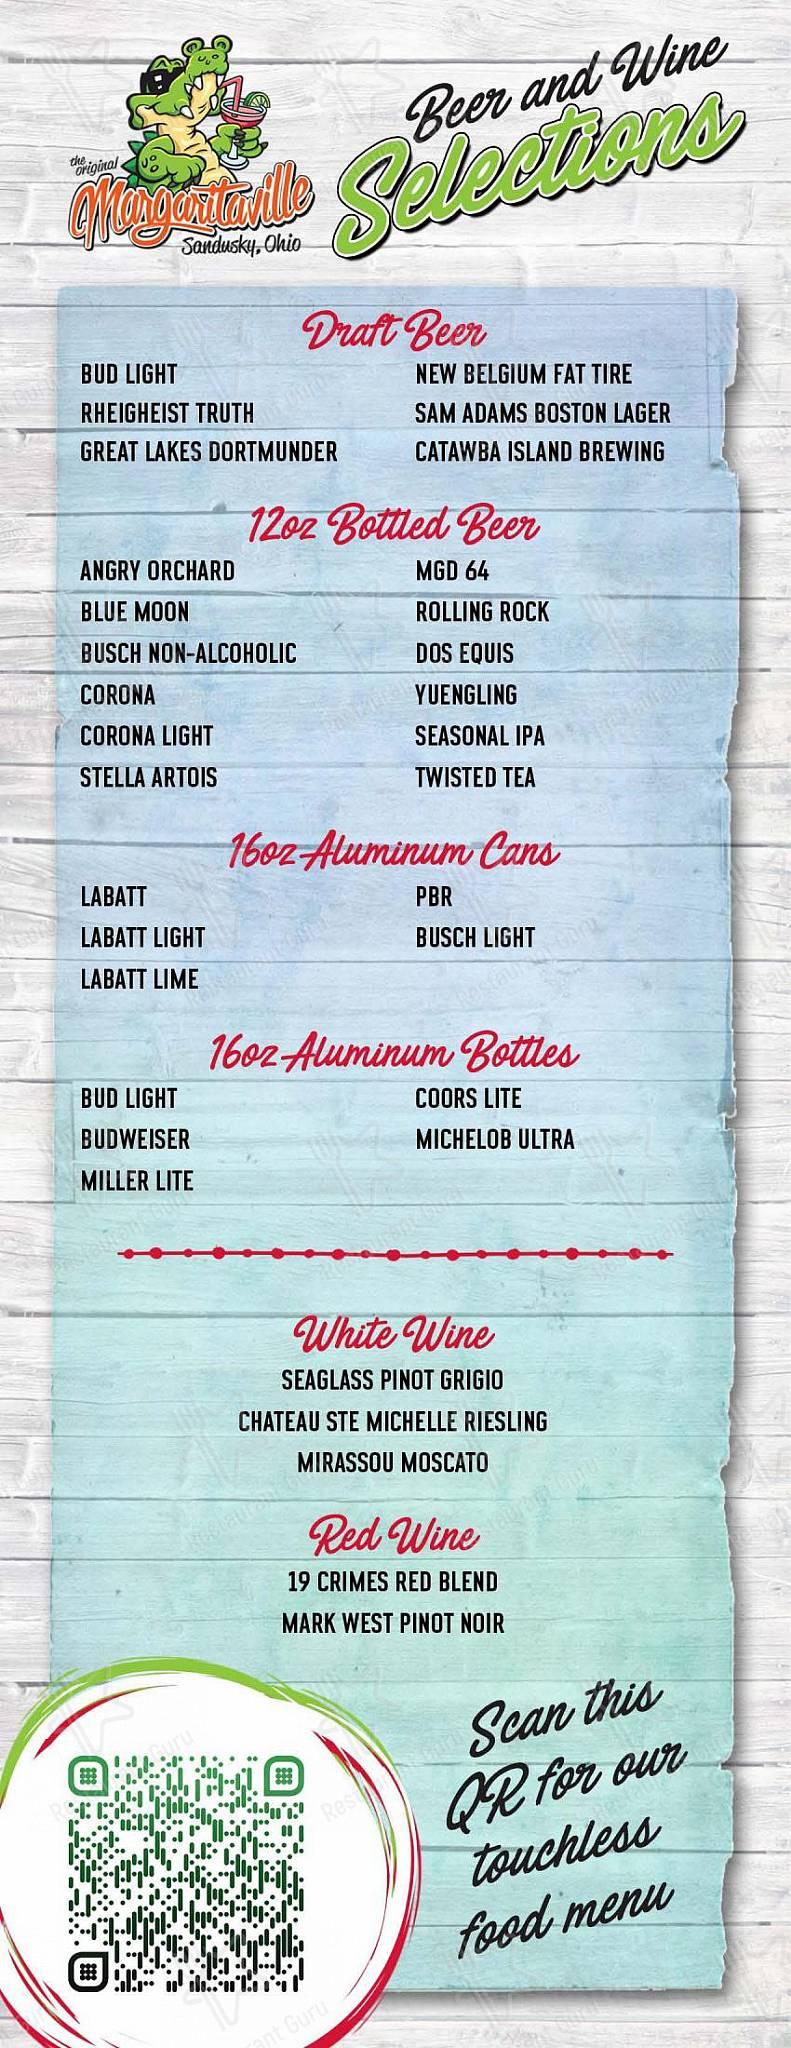 Menu for the Original Margaritaville pub & bar